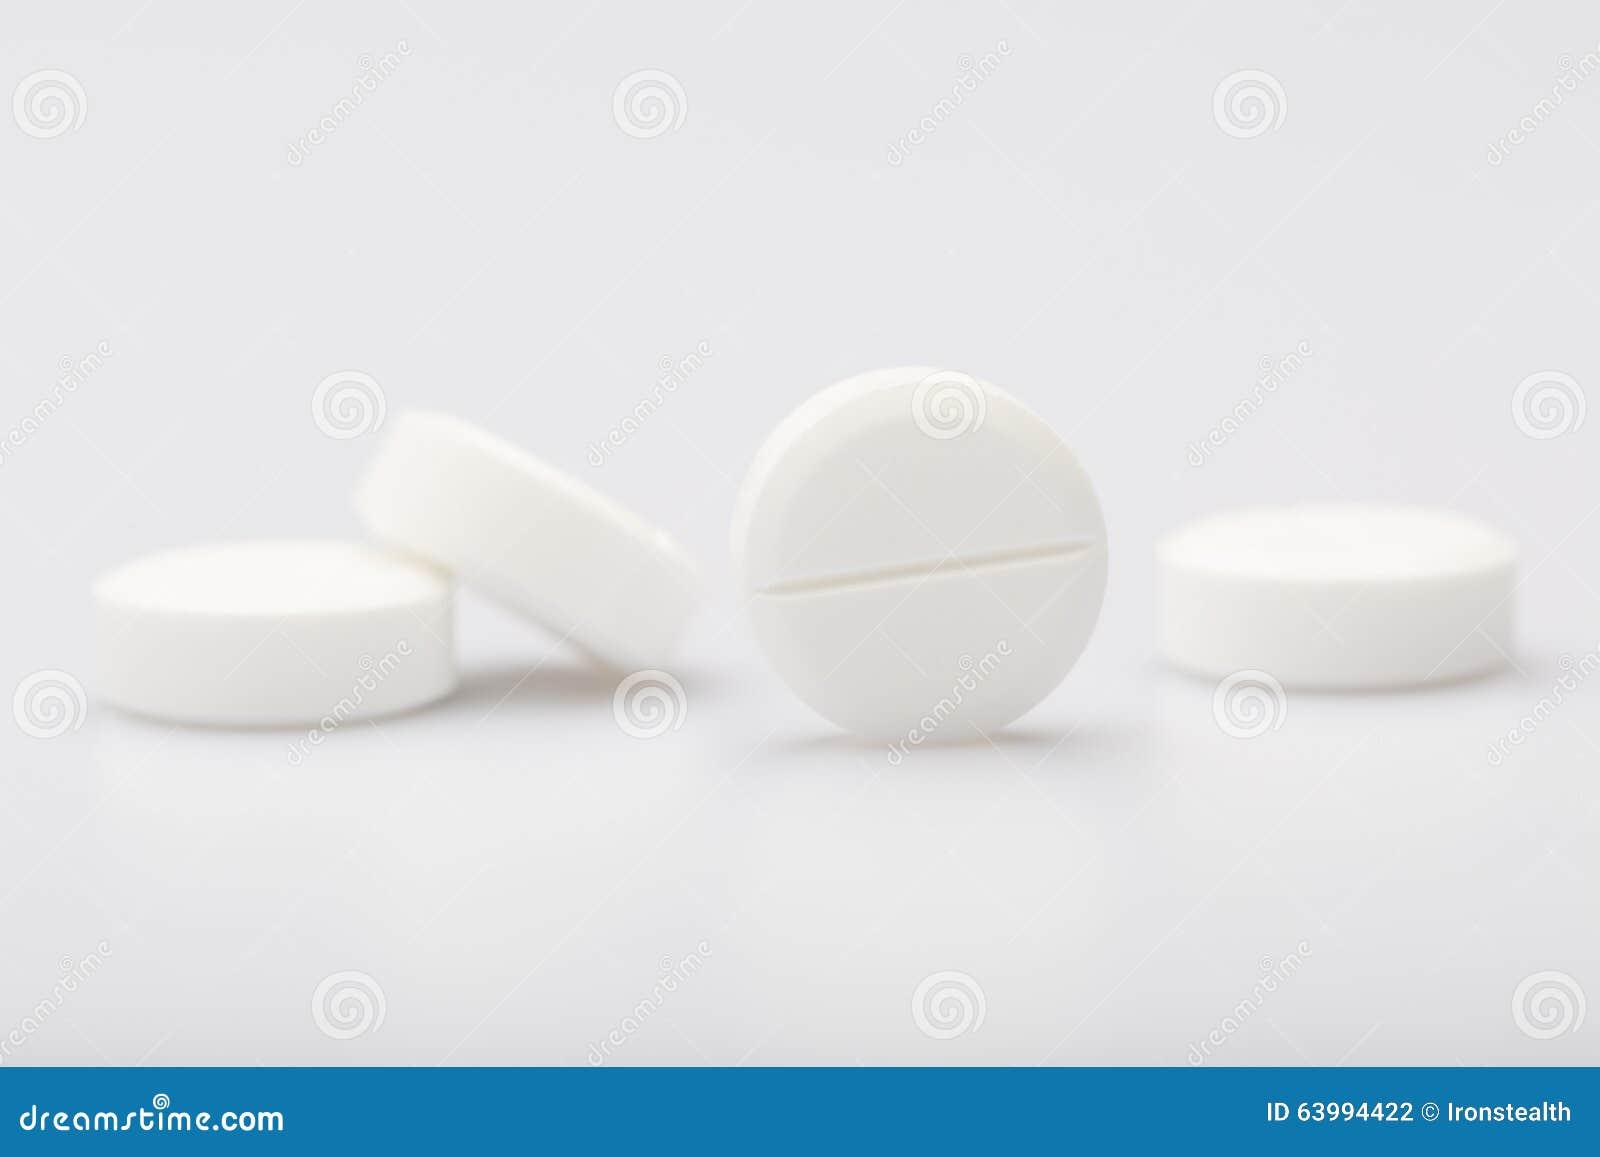 white pills on a white background stock photo image